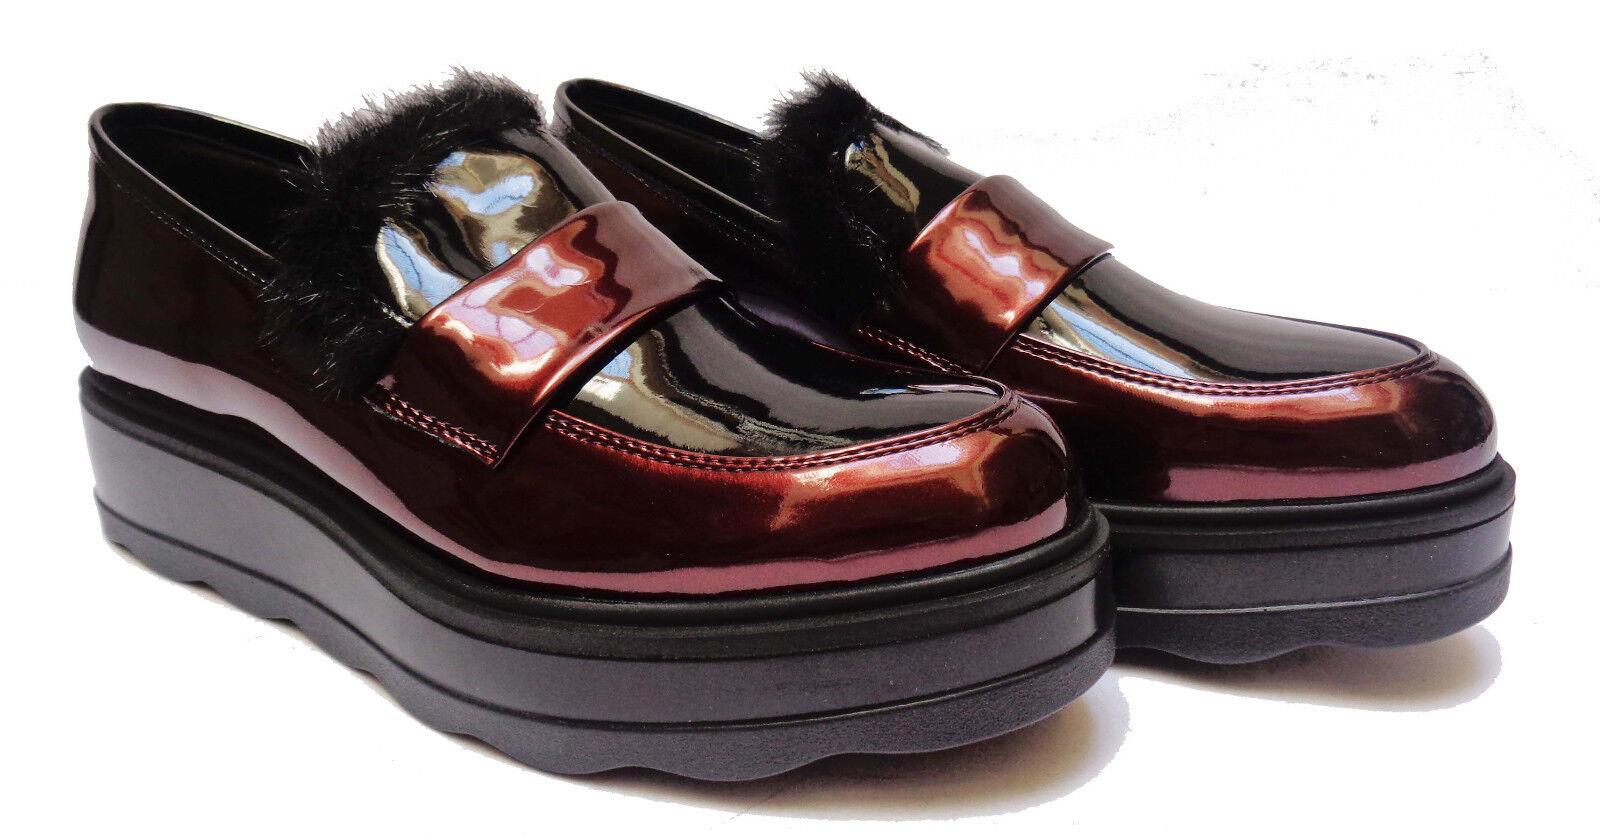 Schuhe DA Damens CINZIA SOFT COMODA LINEA COMODA SOFT MOCASSINI IN VERNICE BORDO' ZEPPA CM. 4 1345c5